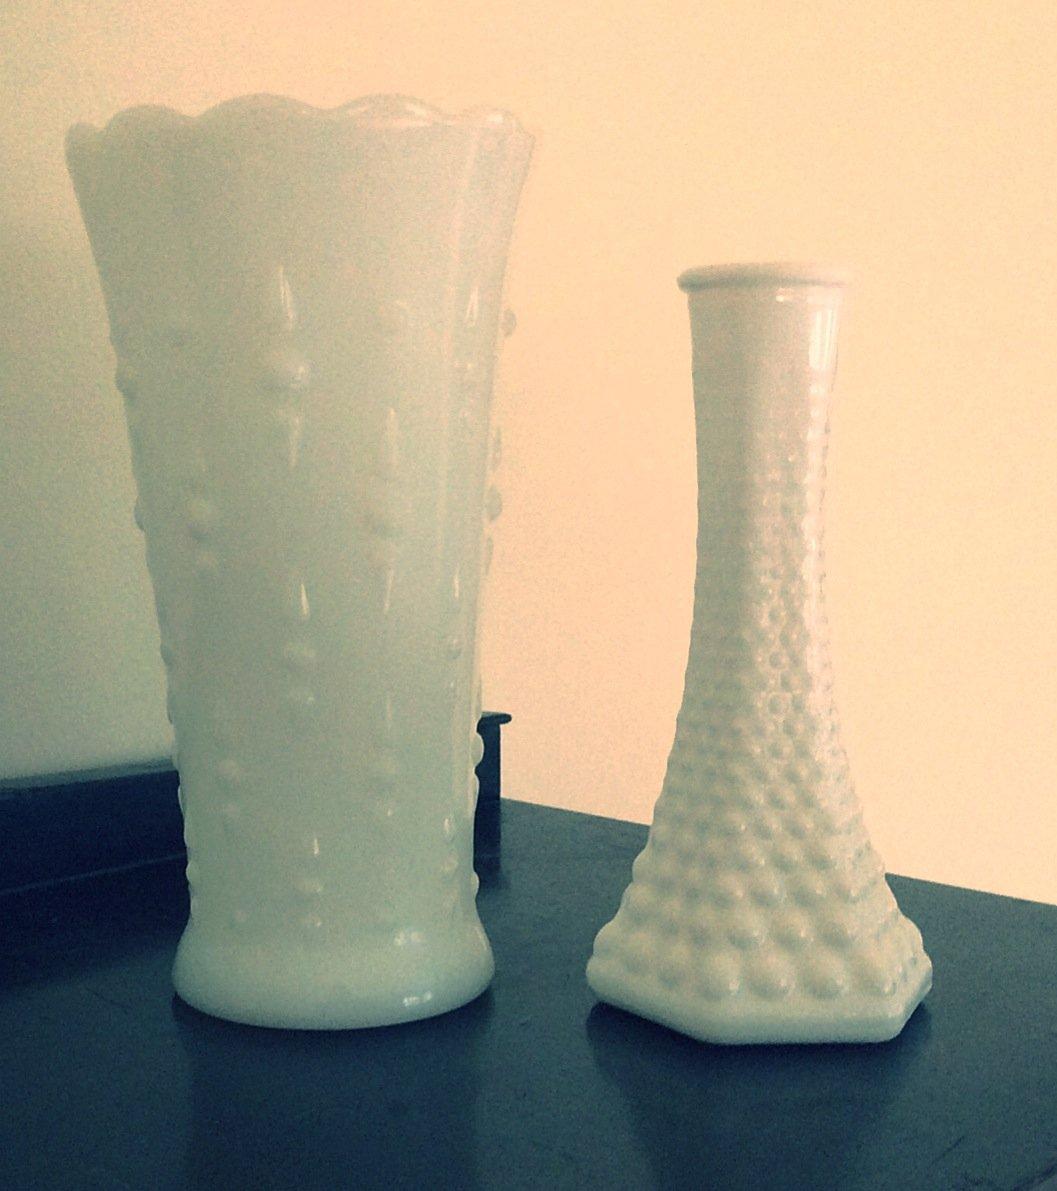 Two Vintage White Hobnail Milk Glass Vases Brody Anchor Hocking Lot